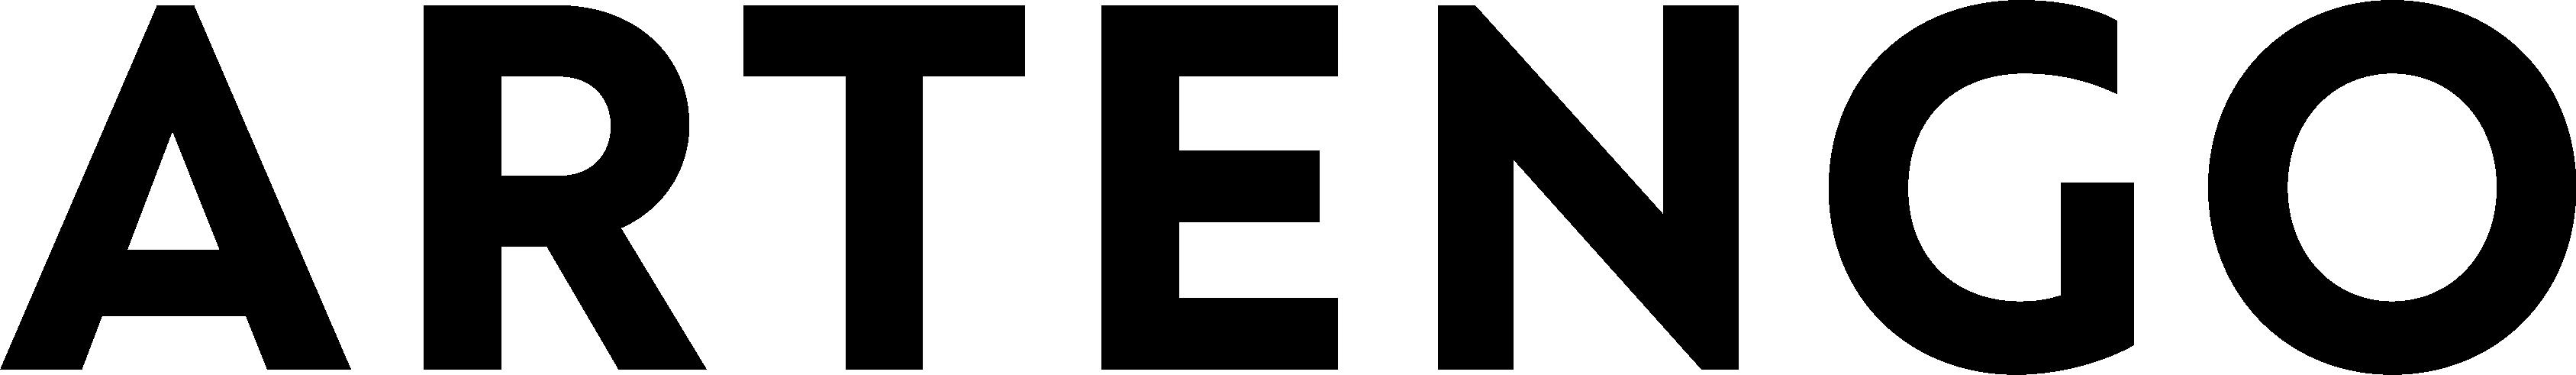 Artengo